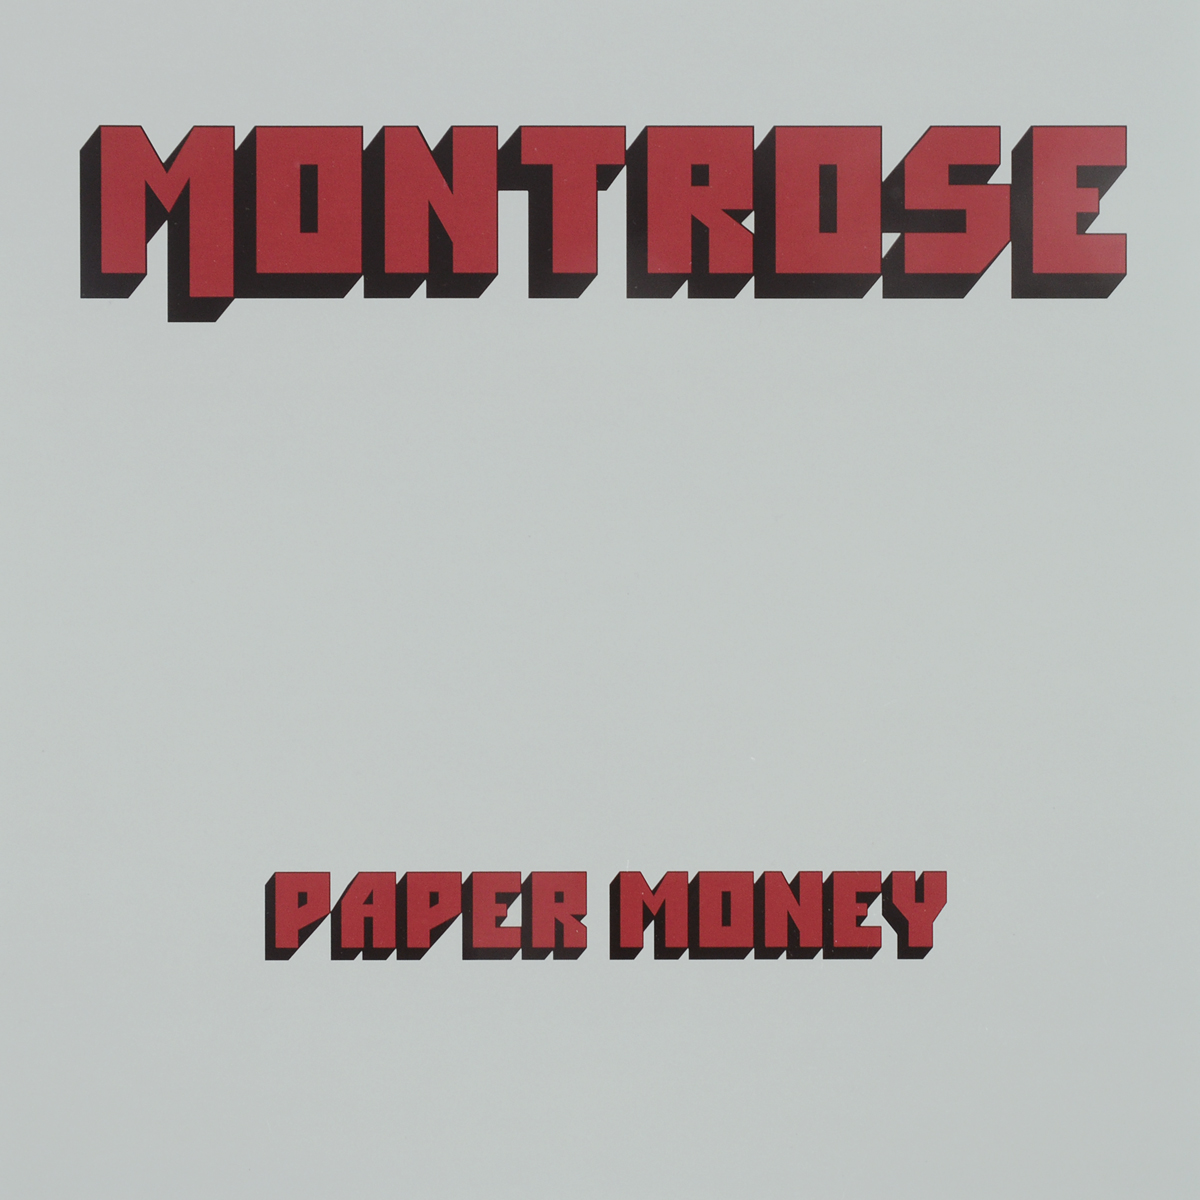 Montrose Montrose. Paper Money (2 LP) montrose montrose montrose 2 lp 180 gr